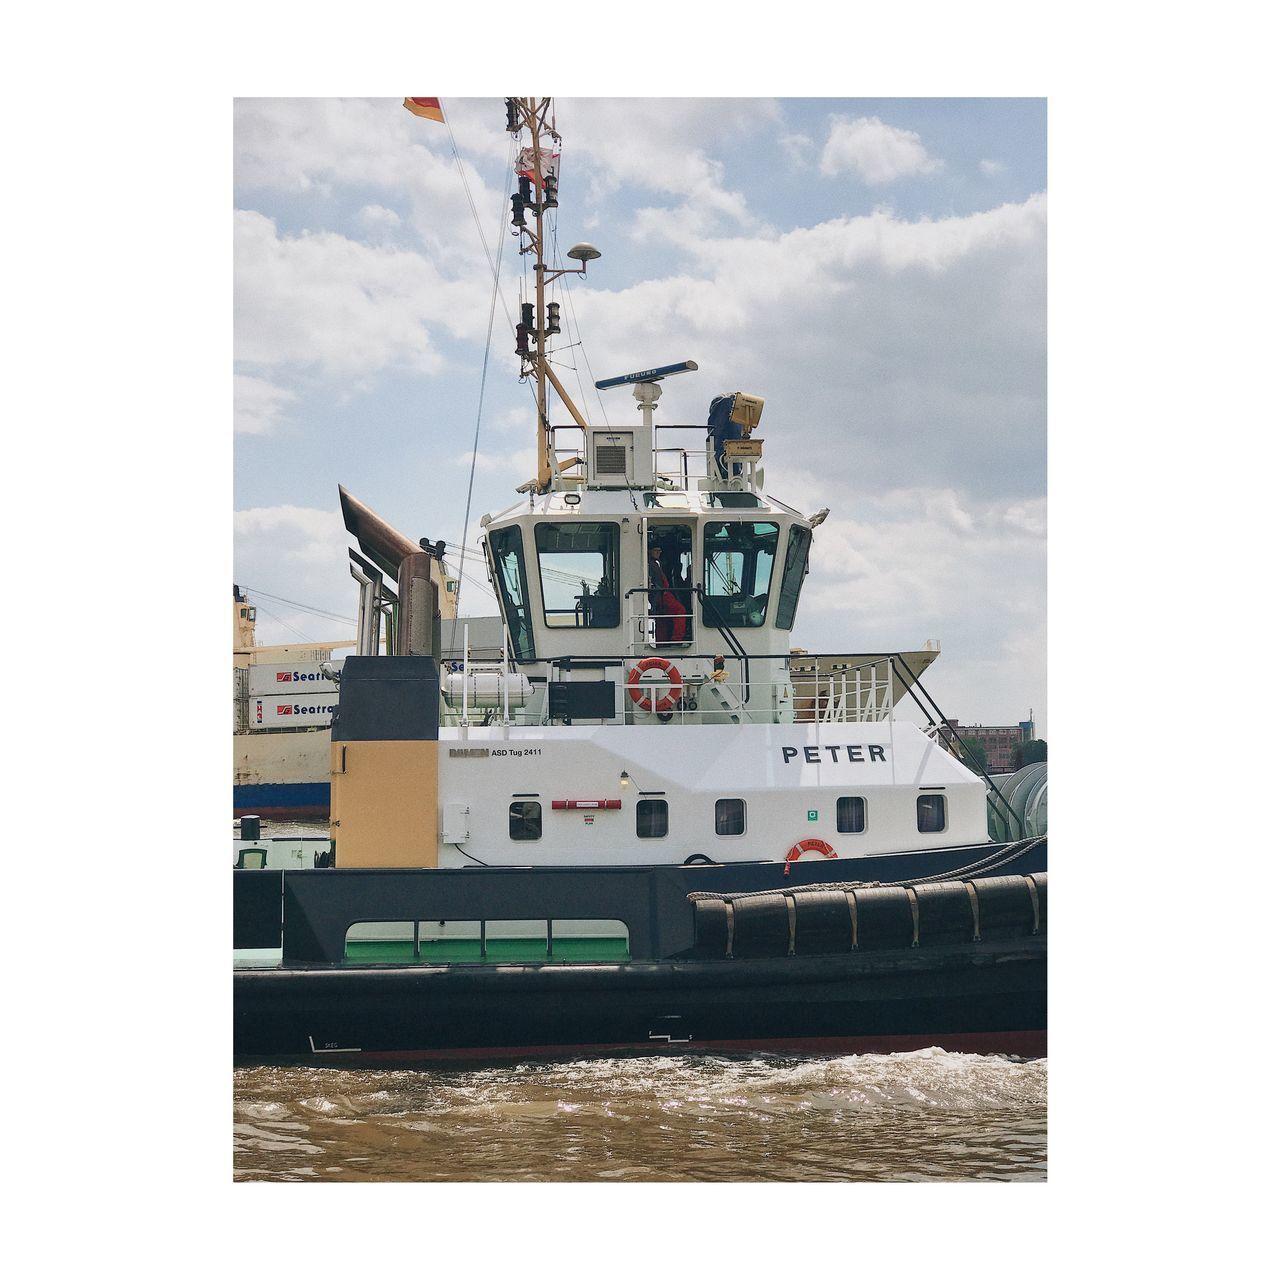 SHIP MOORED AT SEA SHORE AGAINST SKY